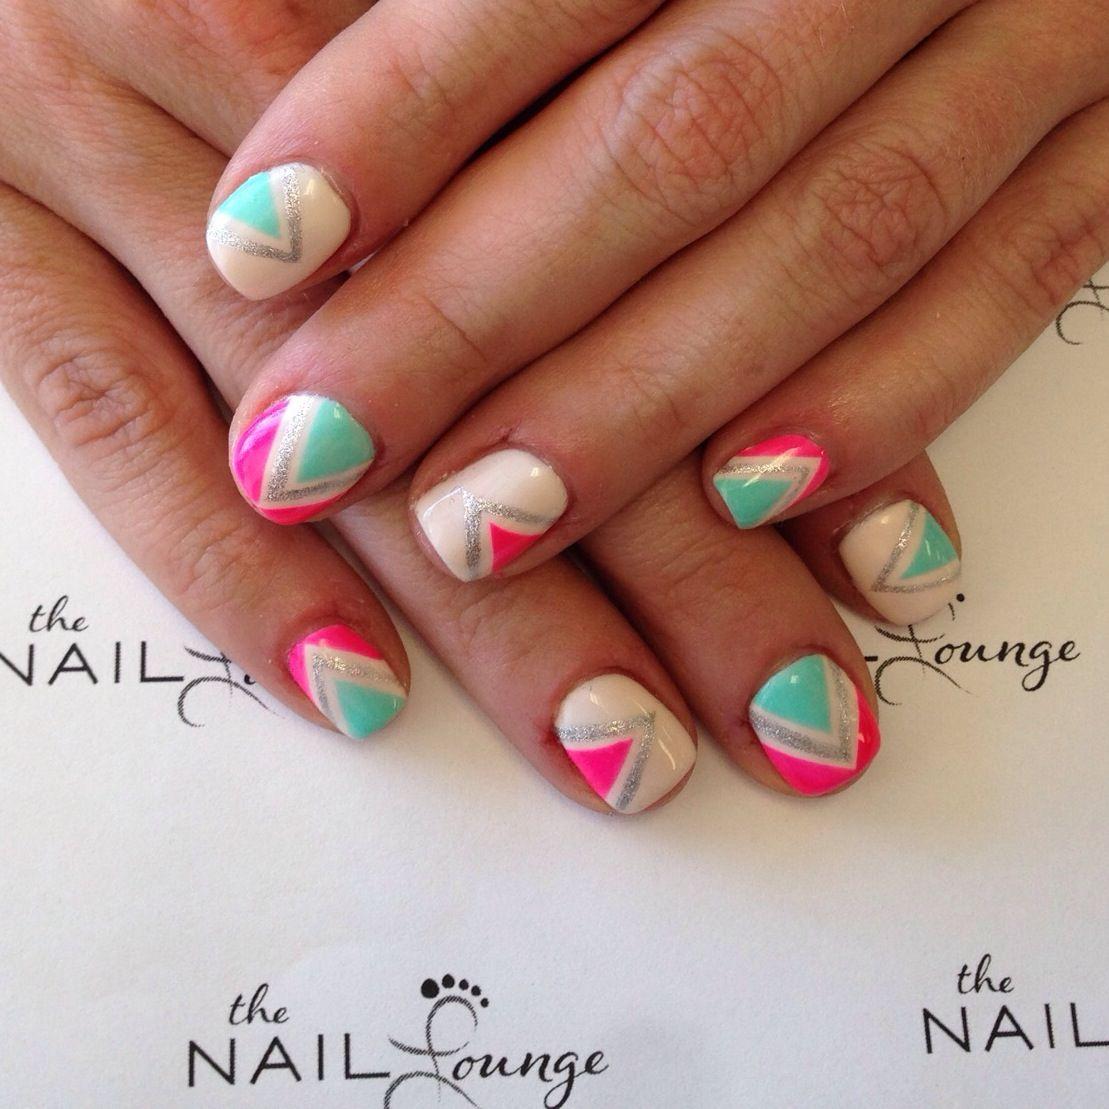 Neon Nail Designs: Bright Neon Gel Nail Art Design